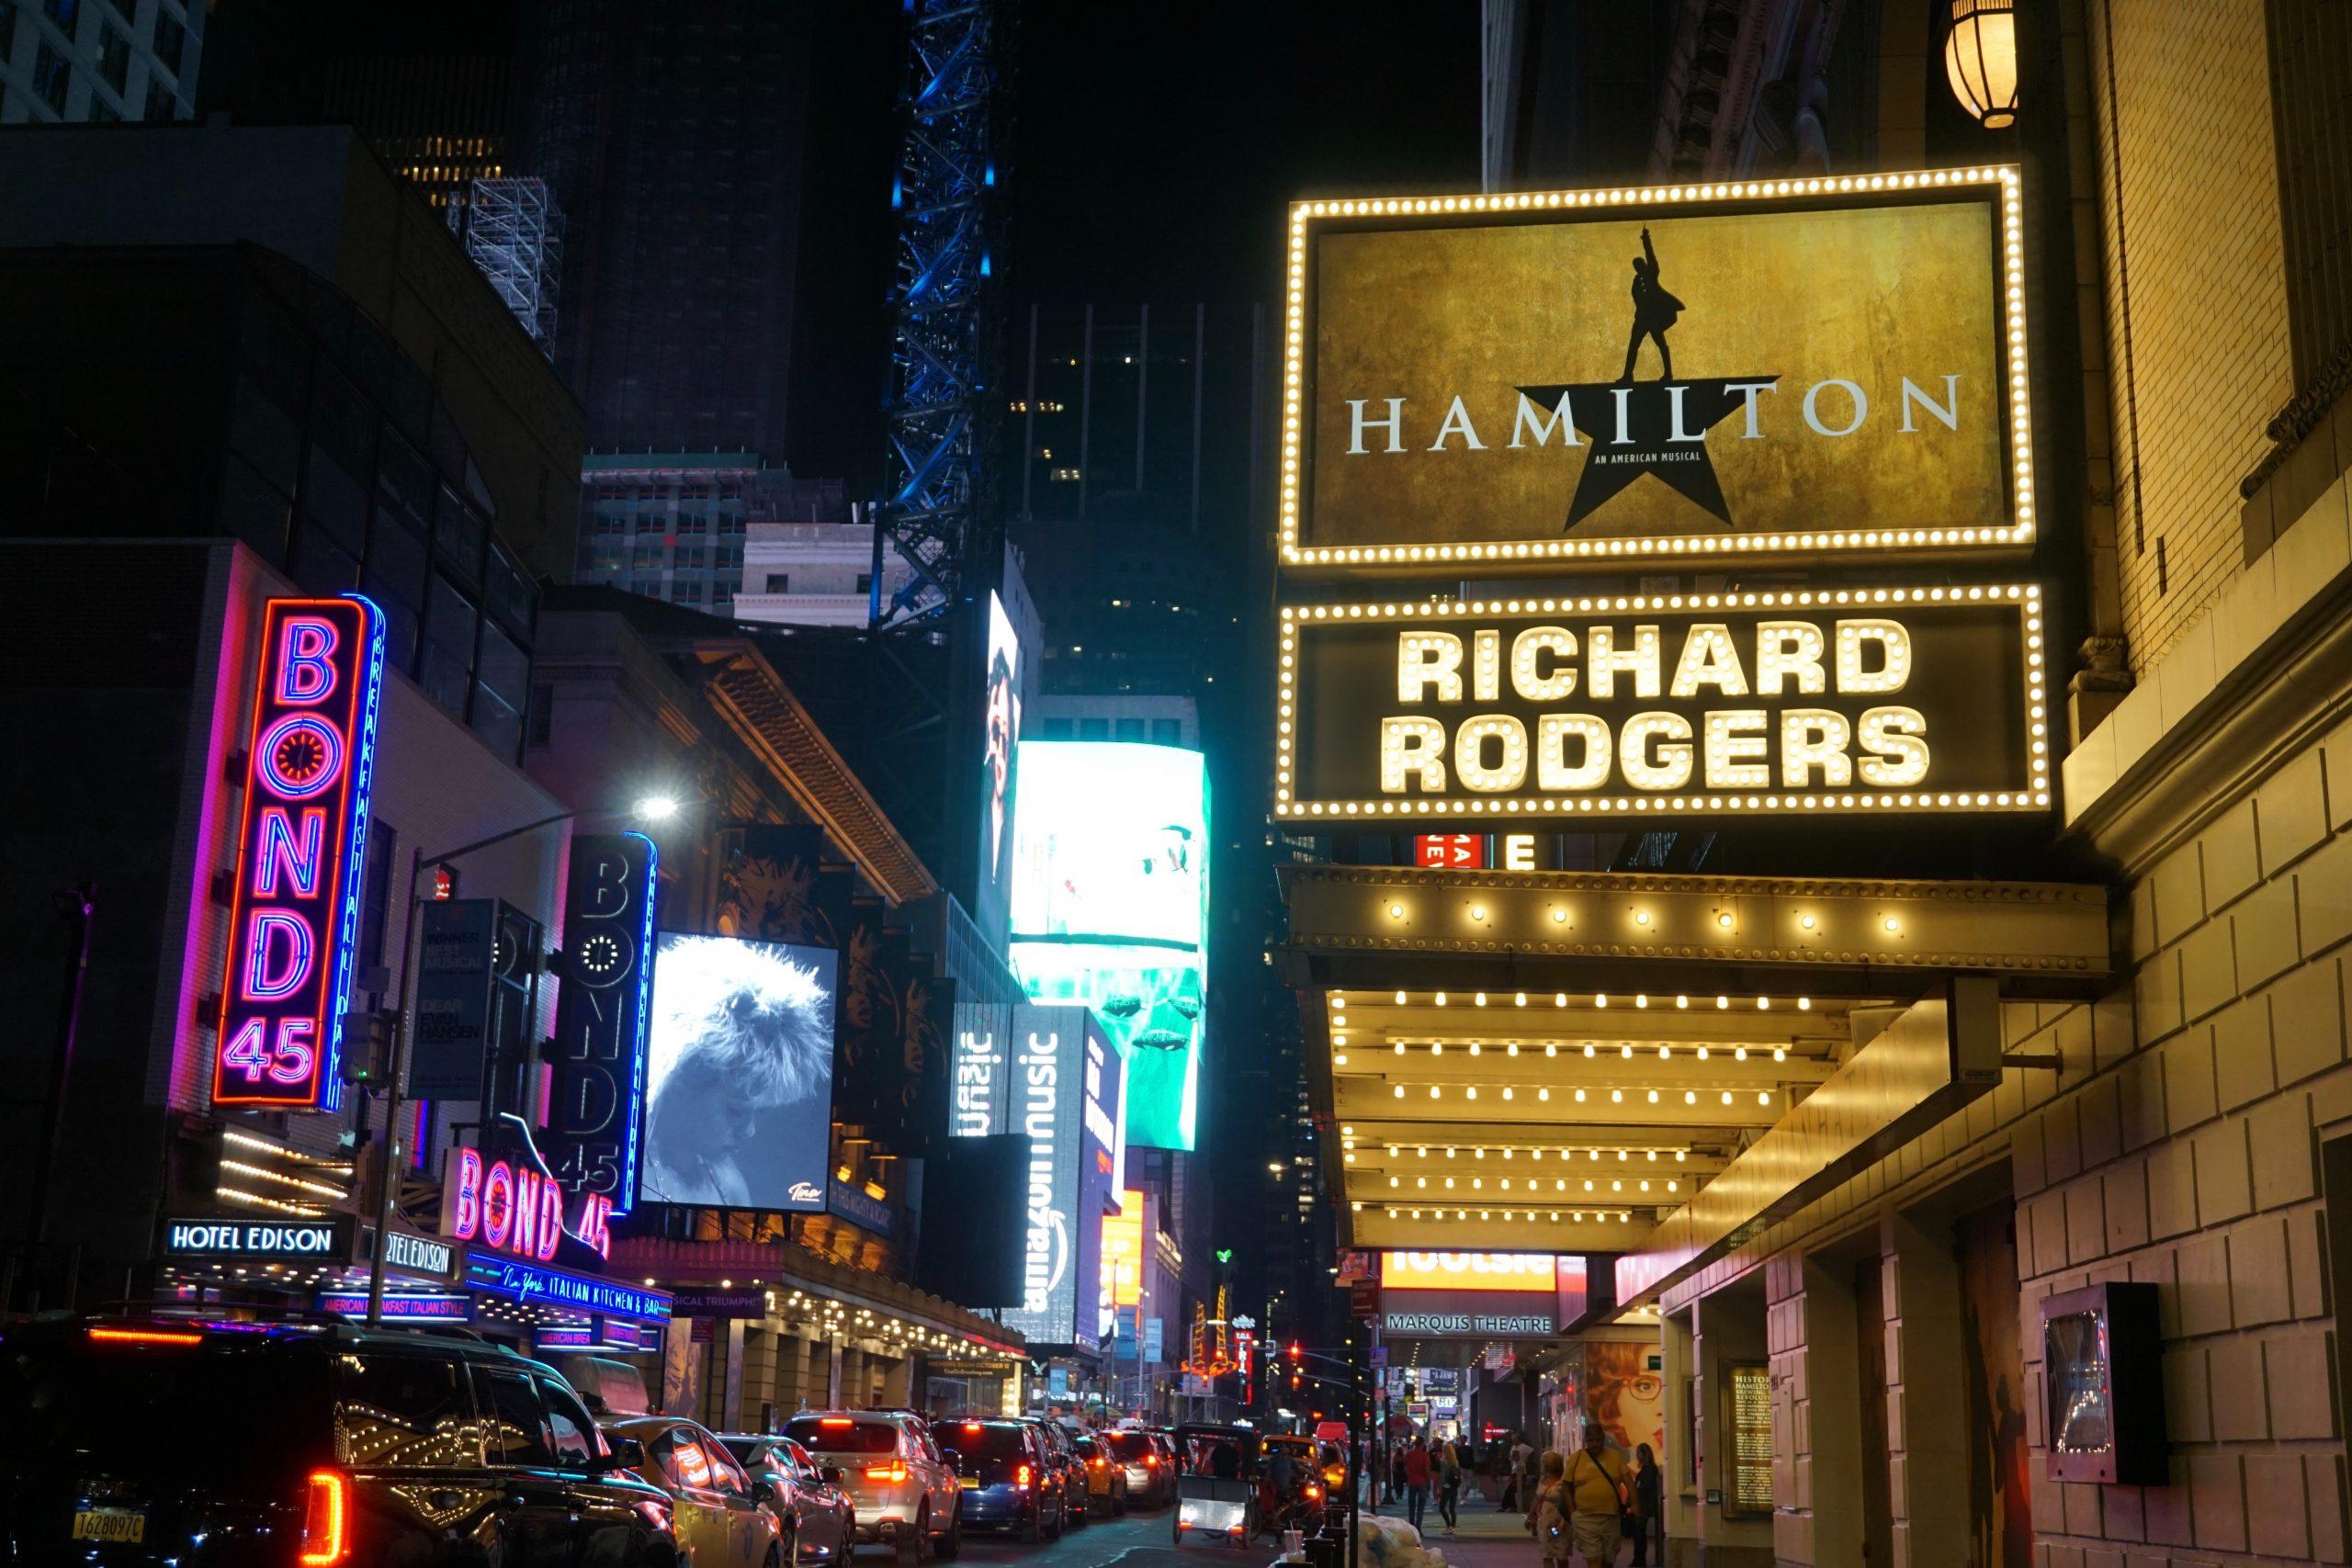 Broadway show image